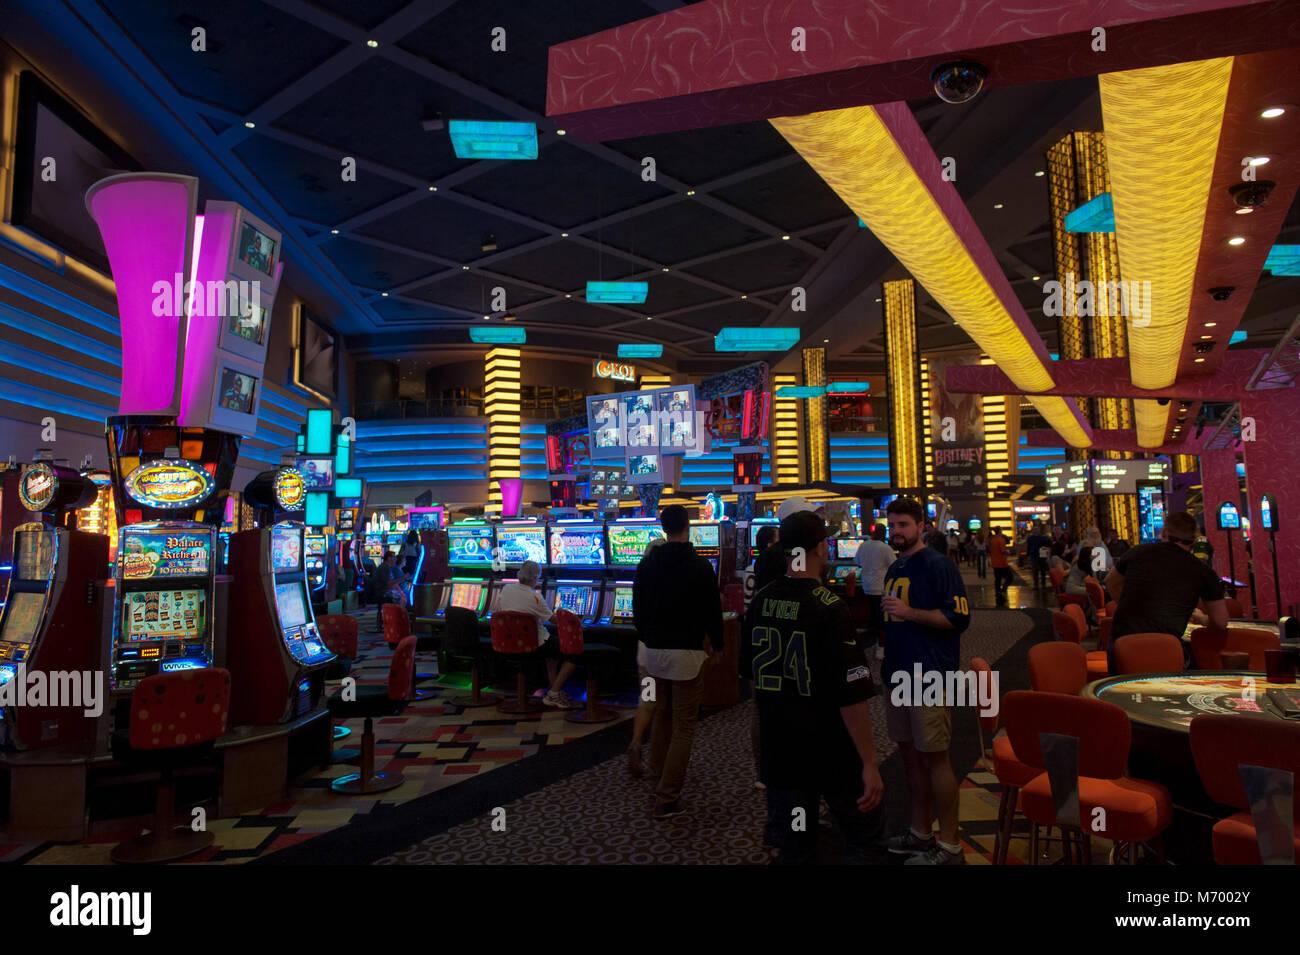 Planet Hollywood Casino Las Vegas Stock Photos & Planet